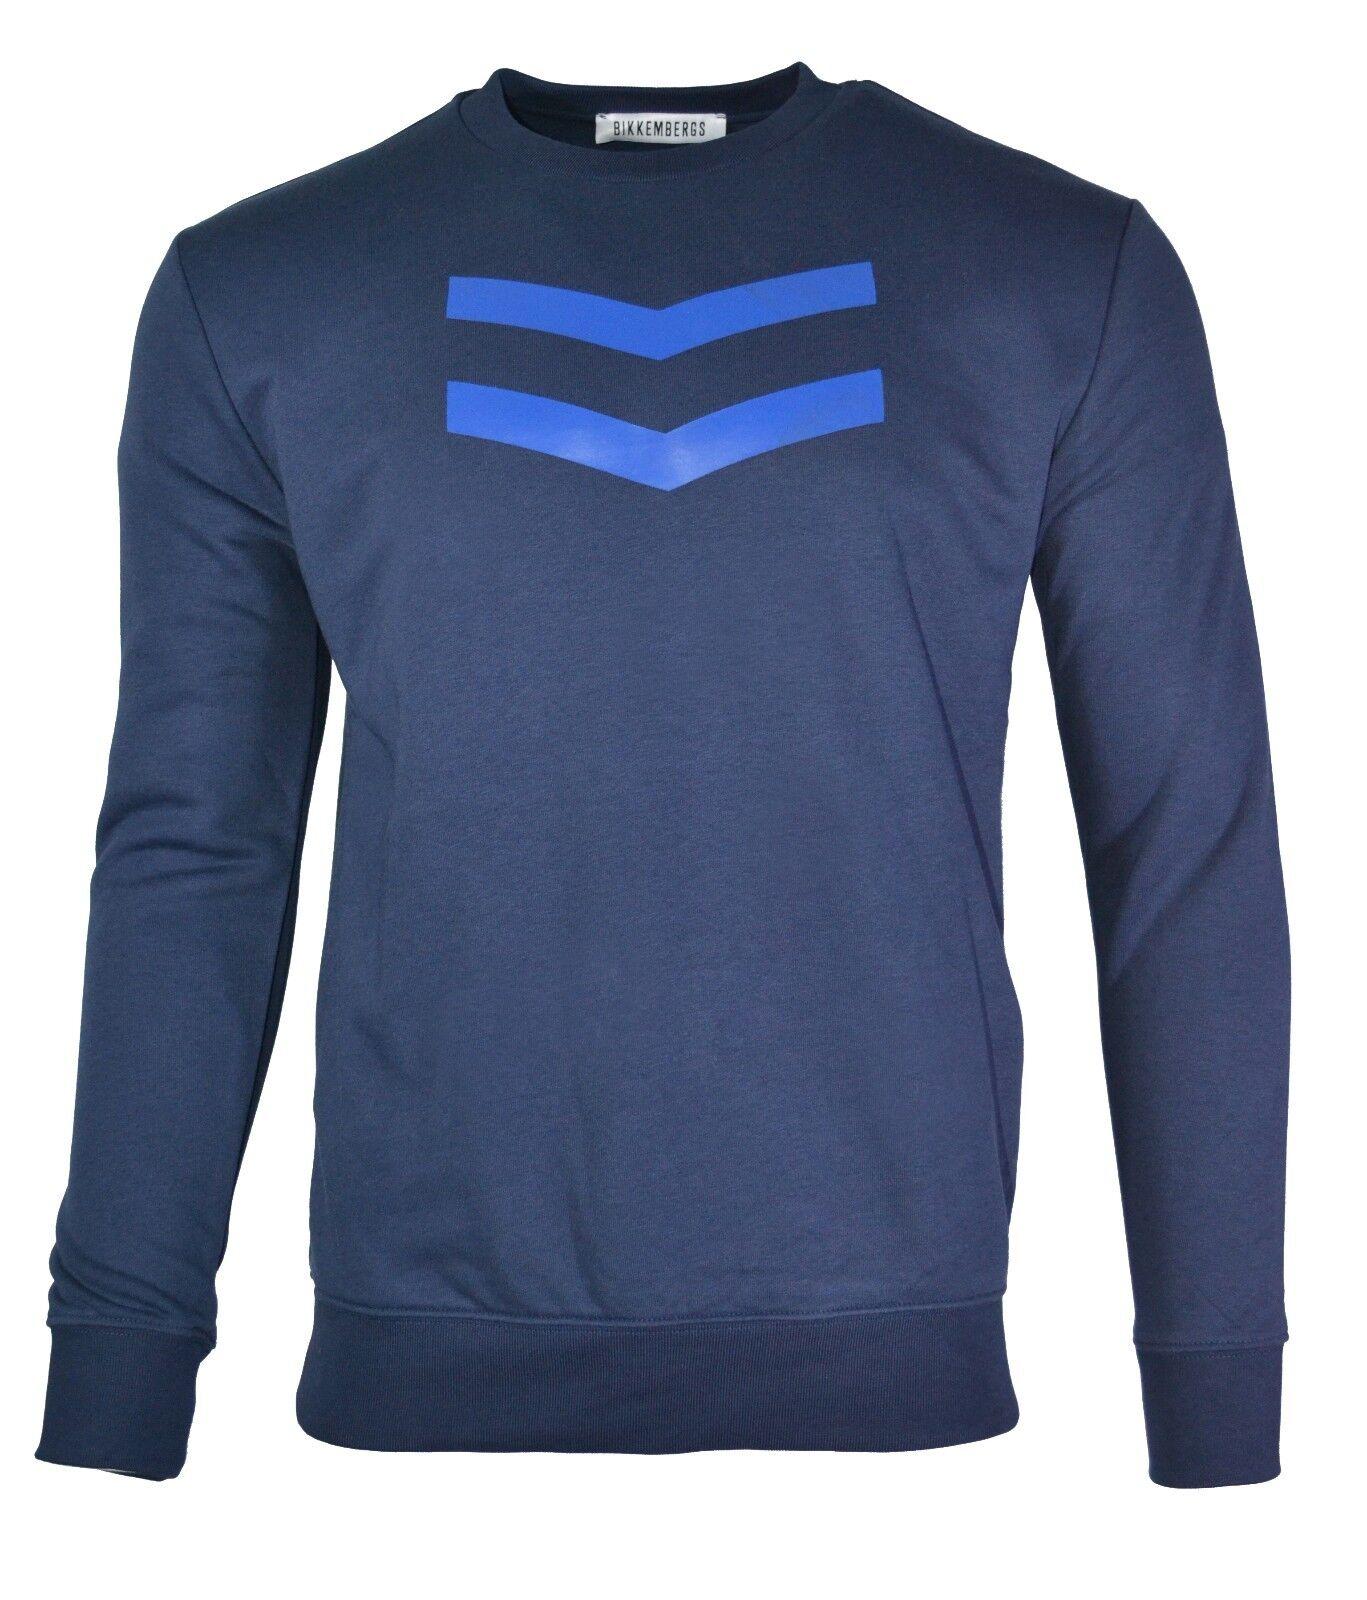 60% OFF   BIKKEMBERGS SWEATSHIRT CHEVRON LOGO TOP Blau C600201M3809Y91 RARE